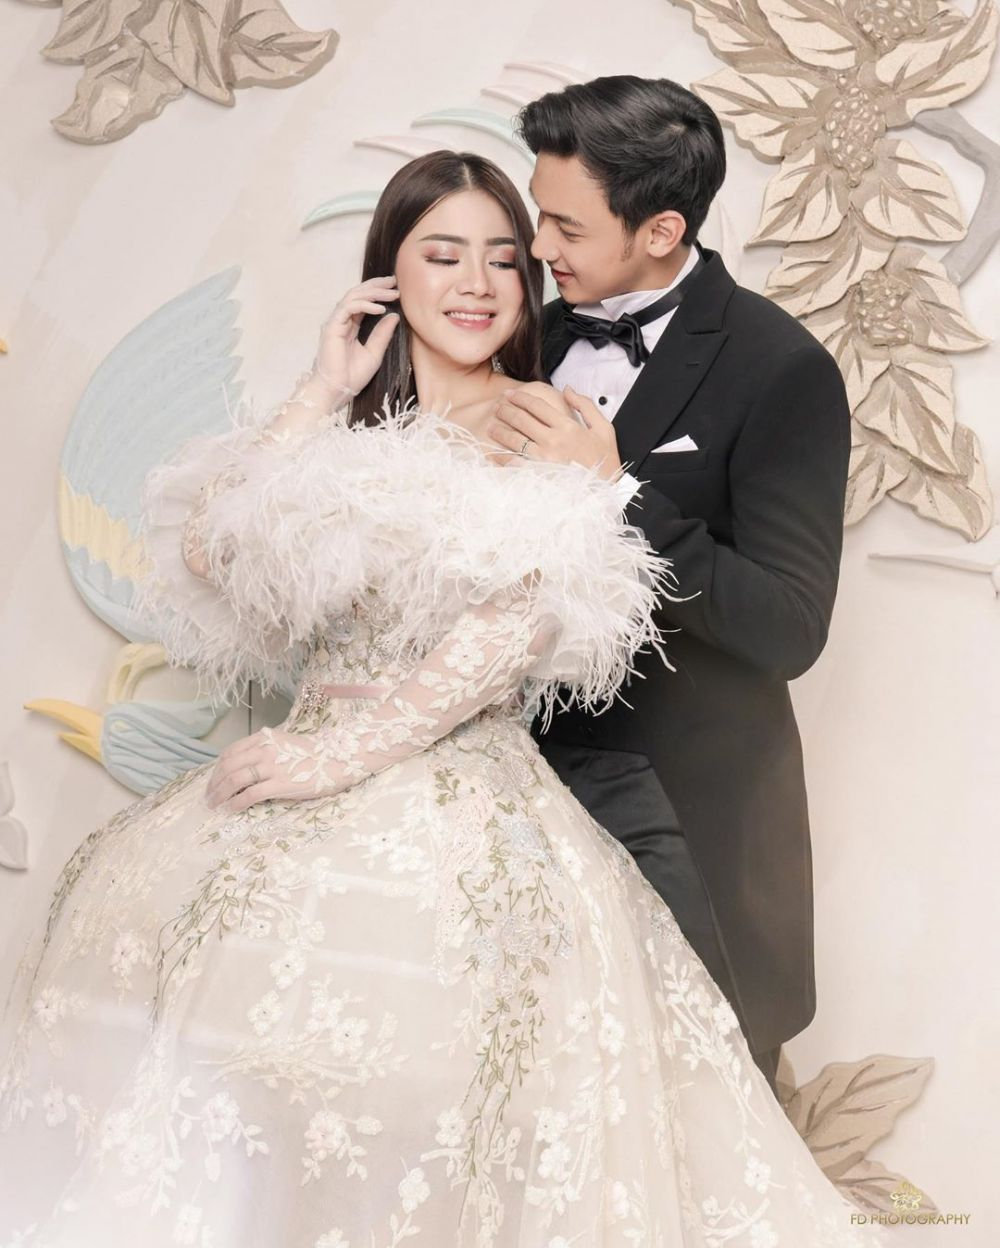 Potret anggun seleb kenakan gaun pengantin © 2020 brilio.net